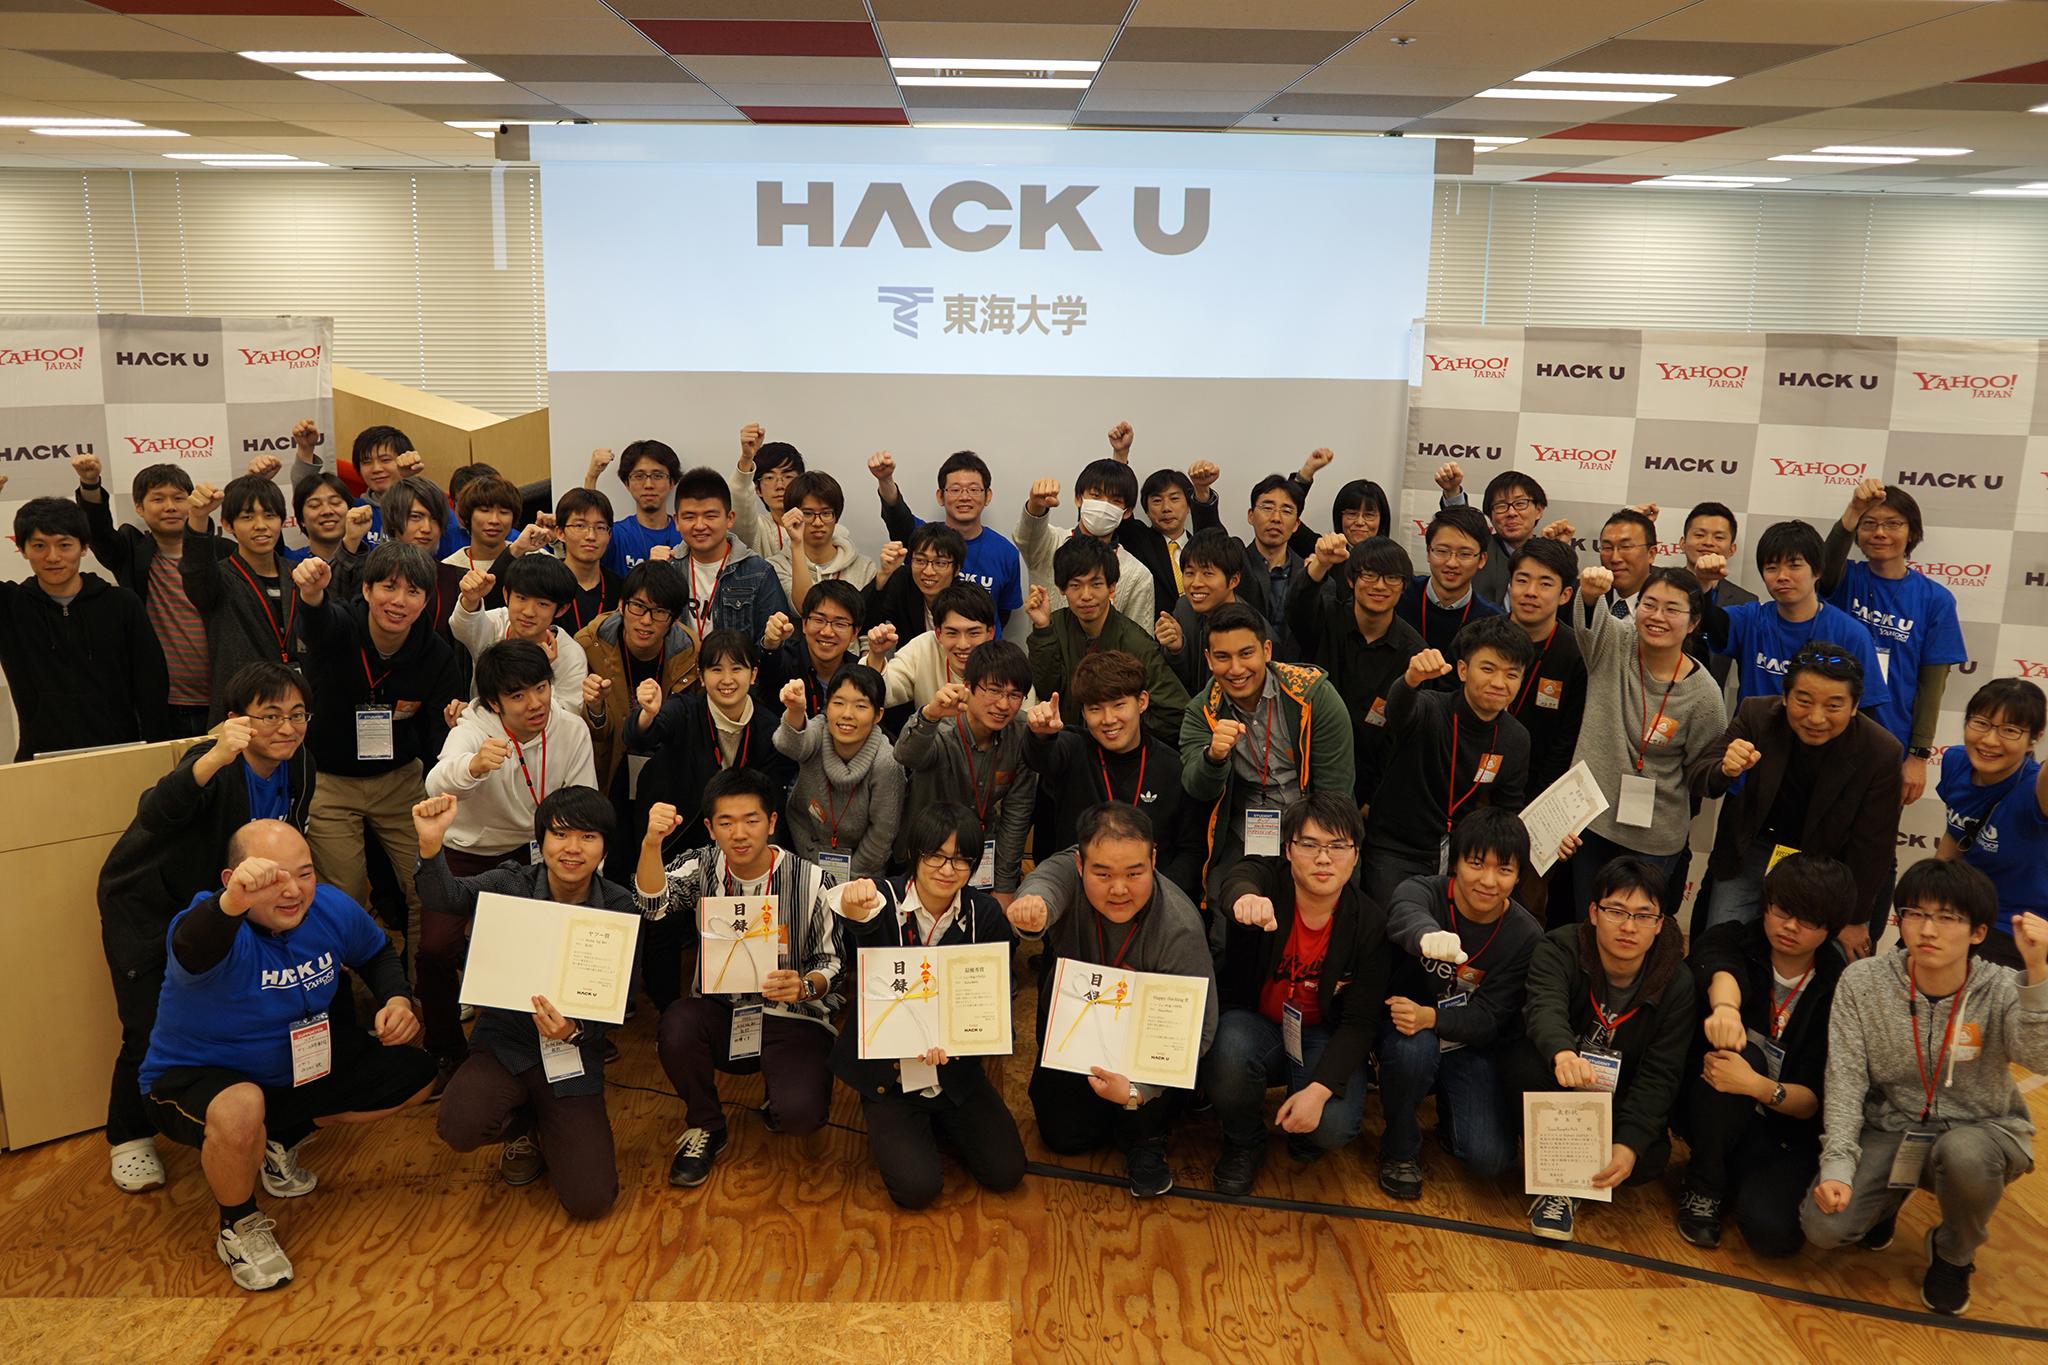 Hack U 東海大学 2019のキービジュアル画像